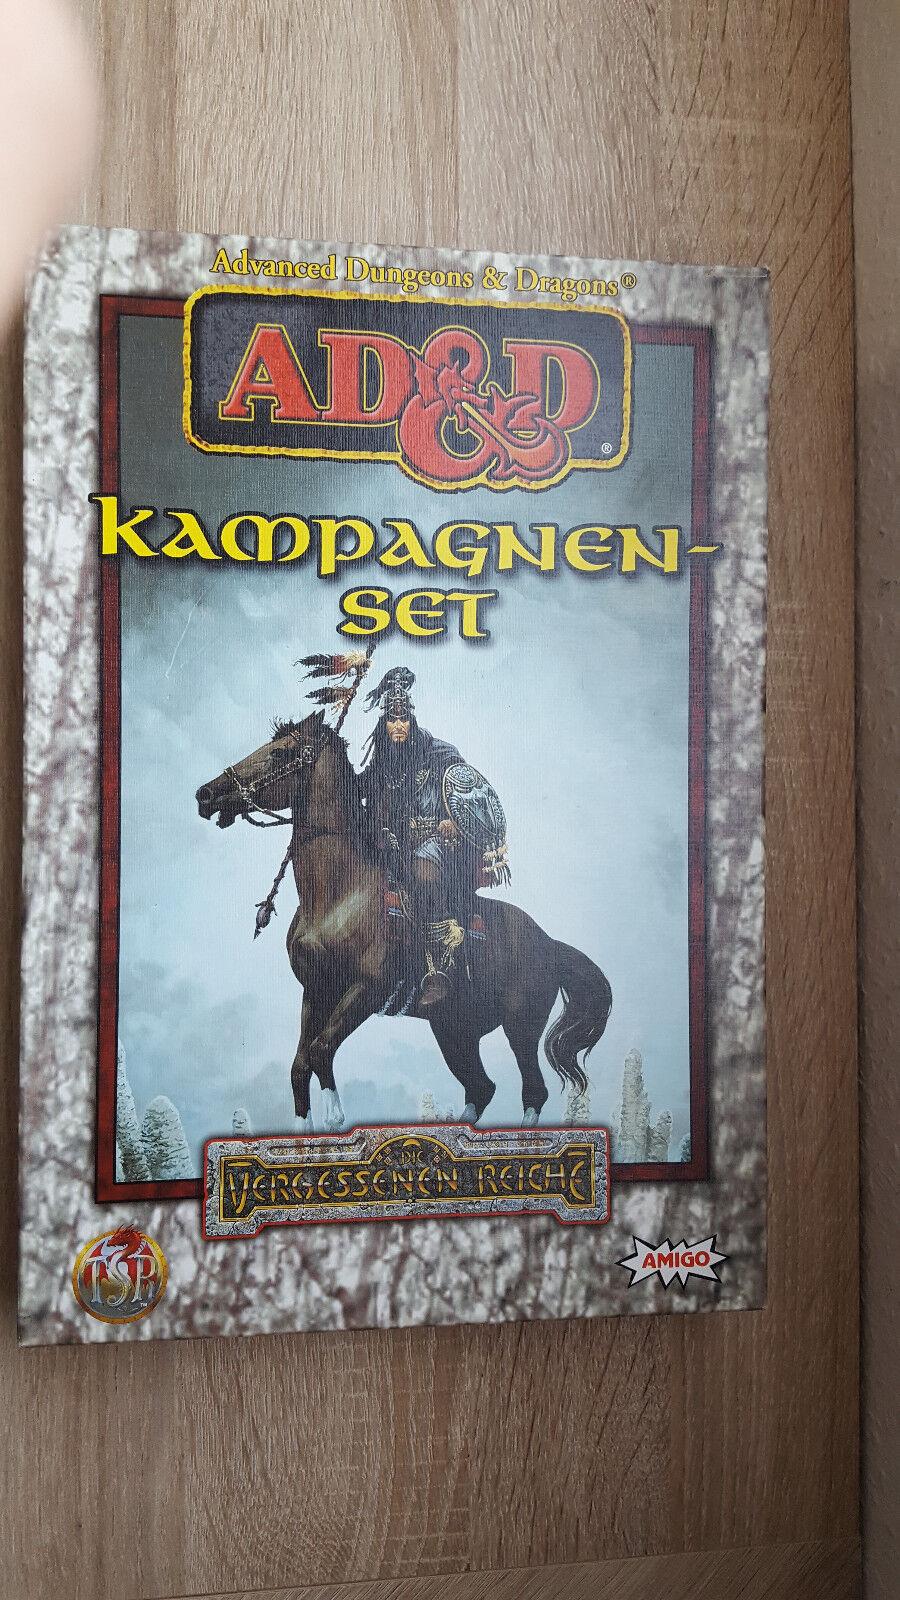 ++ FR Kapagnen Set - Box-Set ++ AD&D 2. Edition 2e, Advanced Dungeons & Dragons